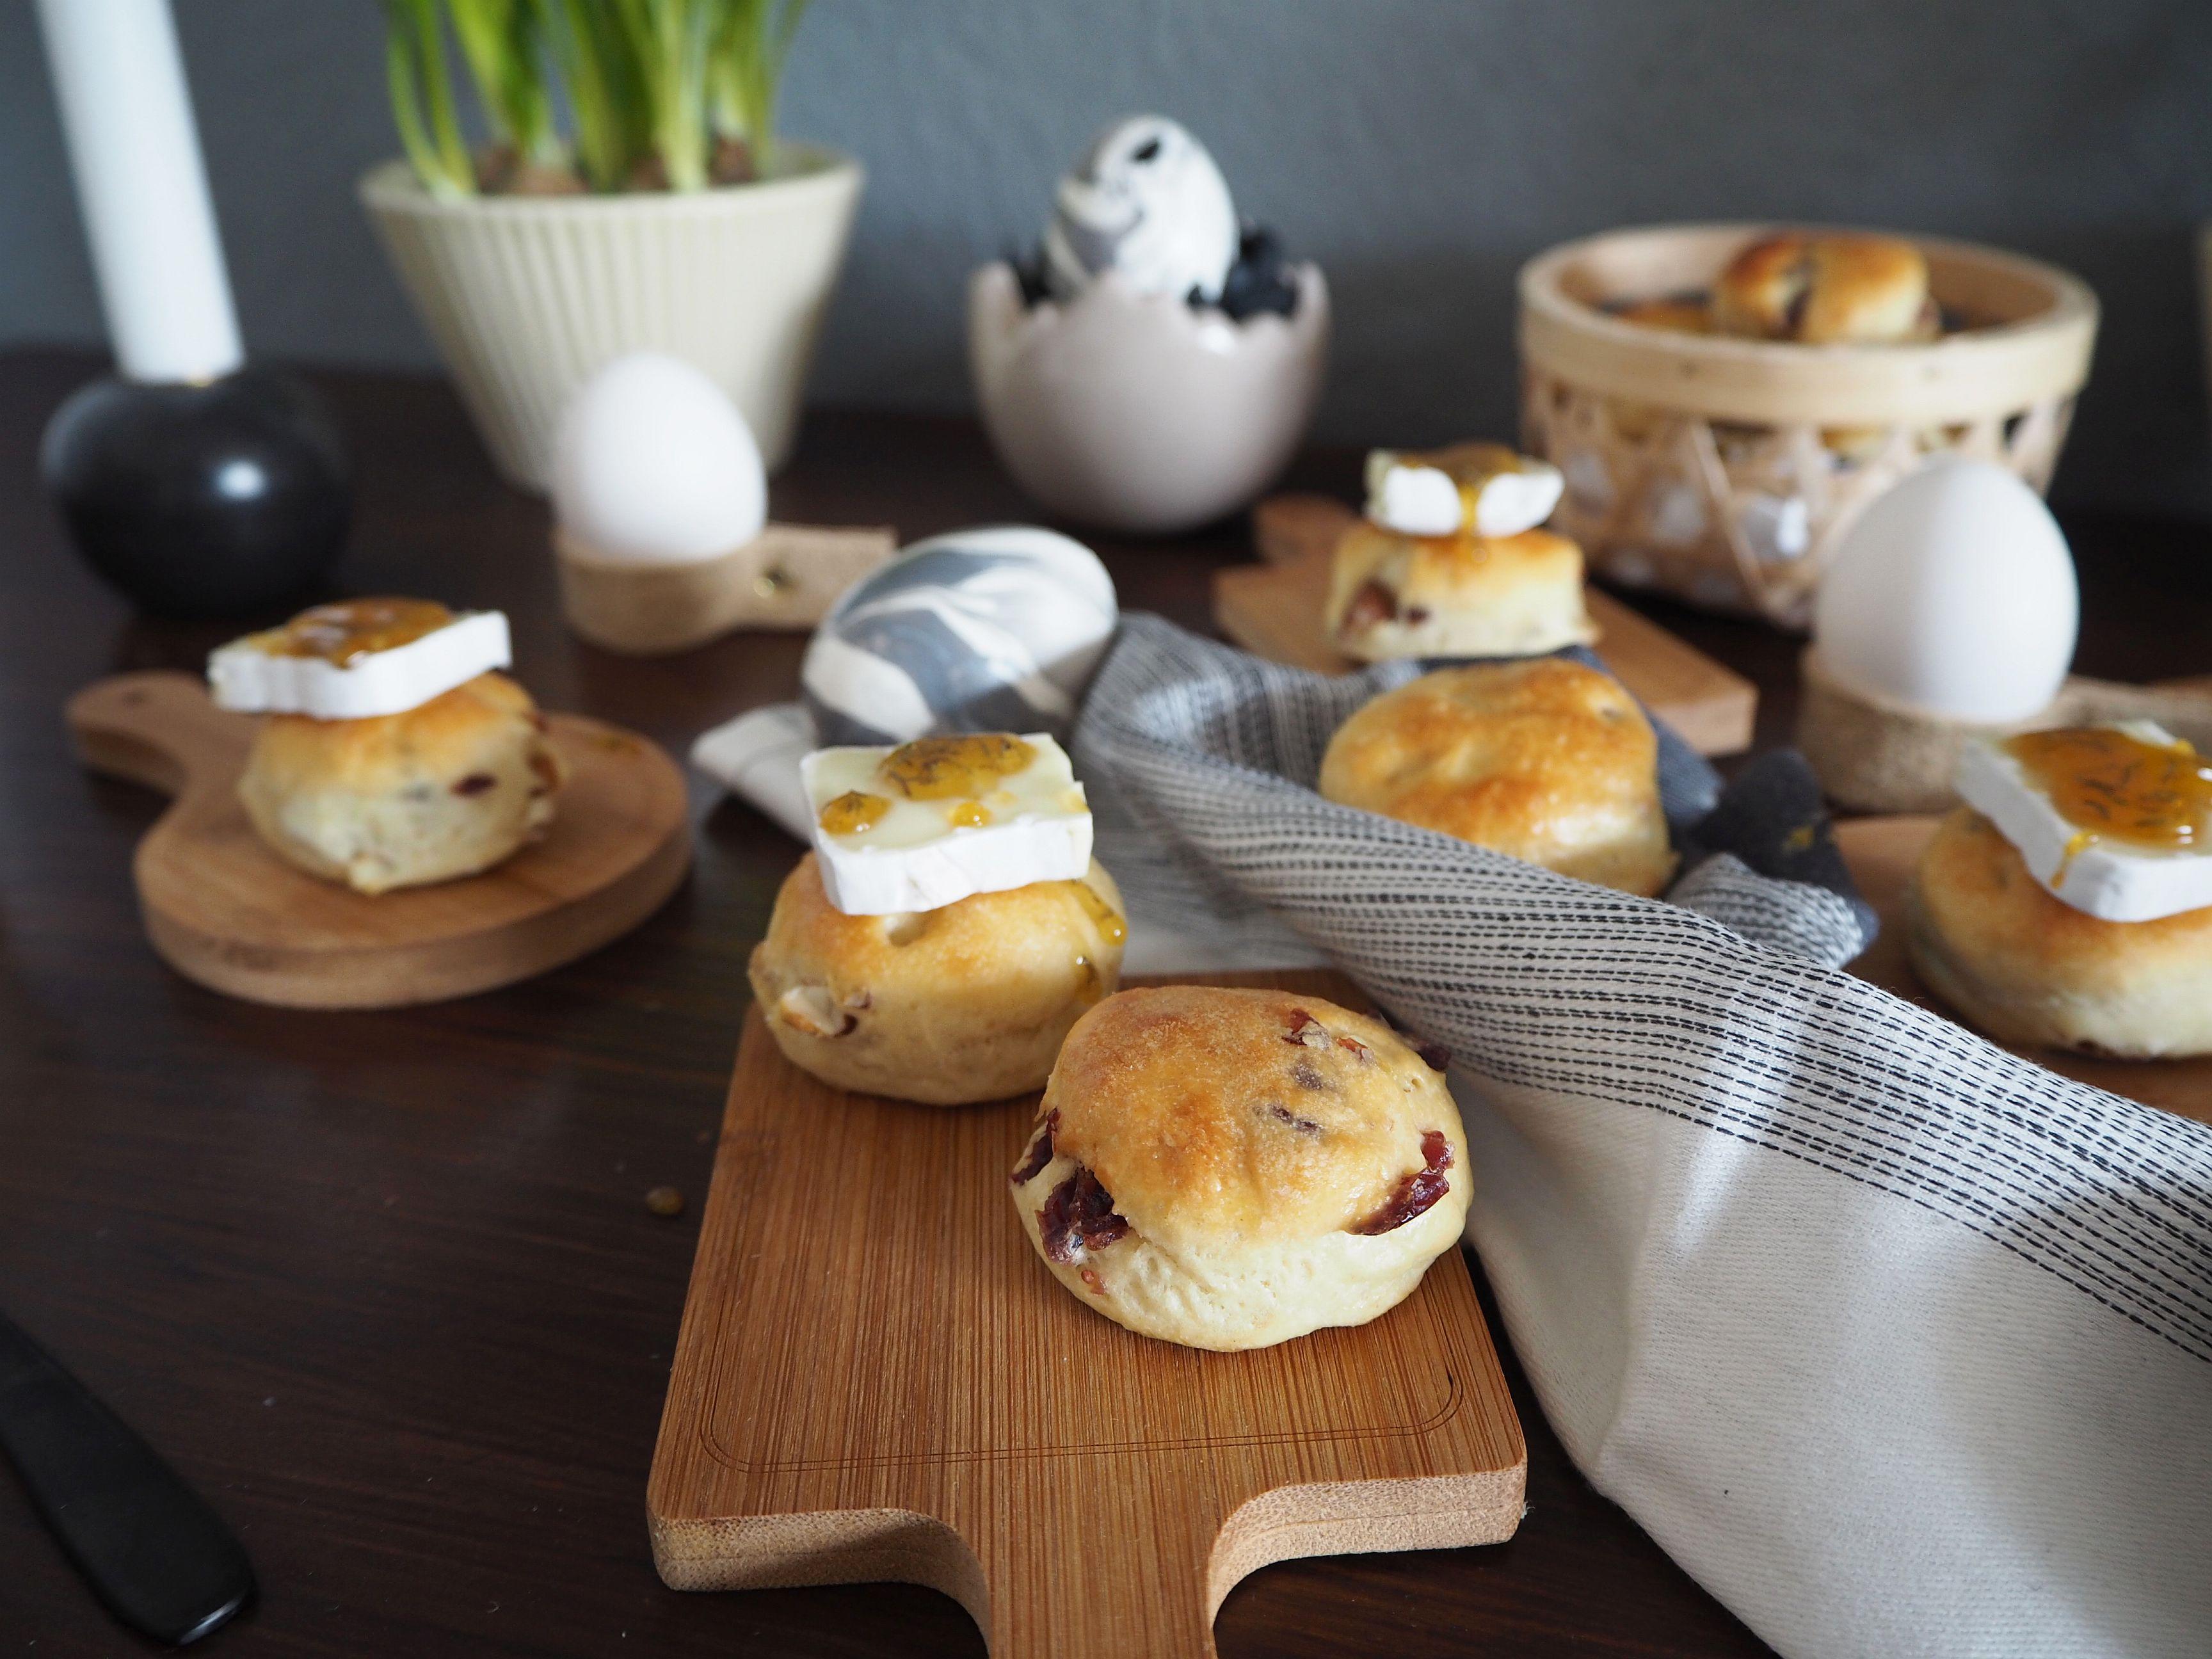 2018-03-skoen-och-kreativ-food-glad-pask-cranberry-mandel-broetchen-ostern (9)